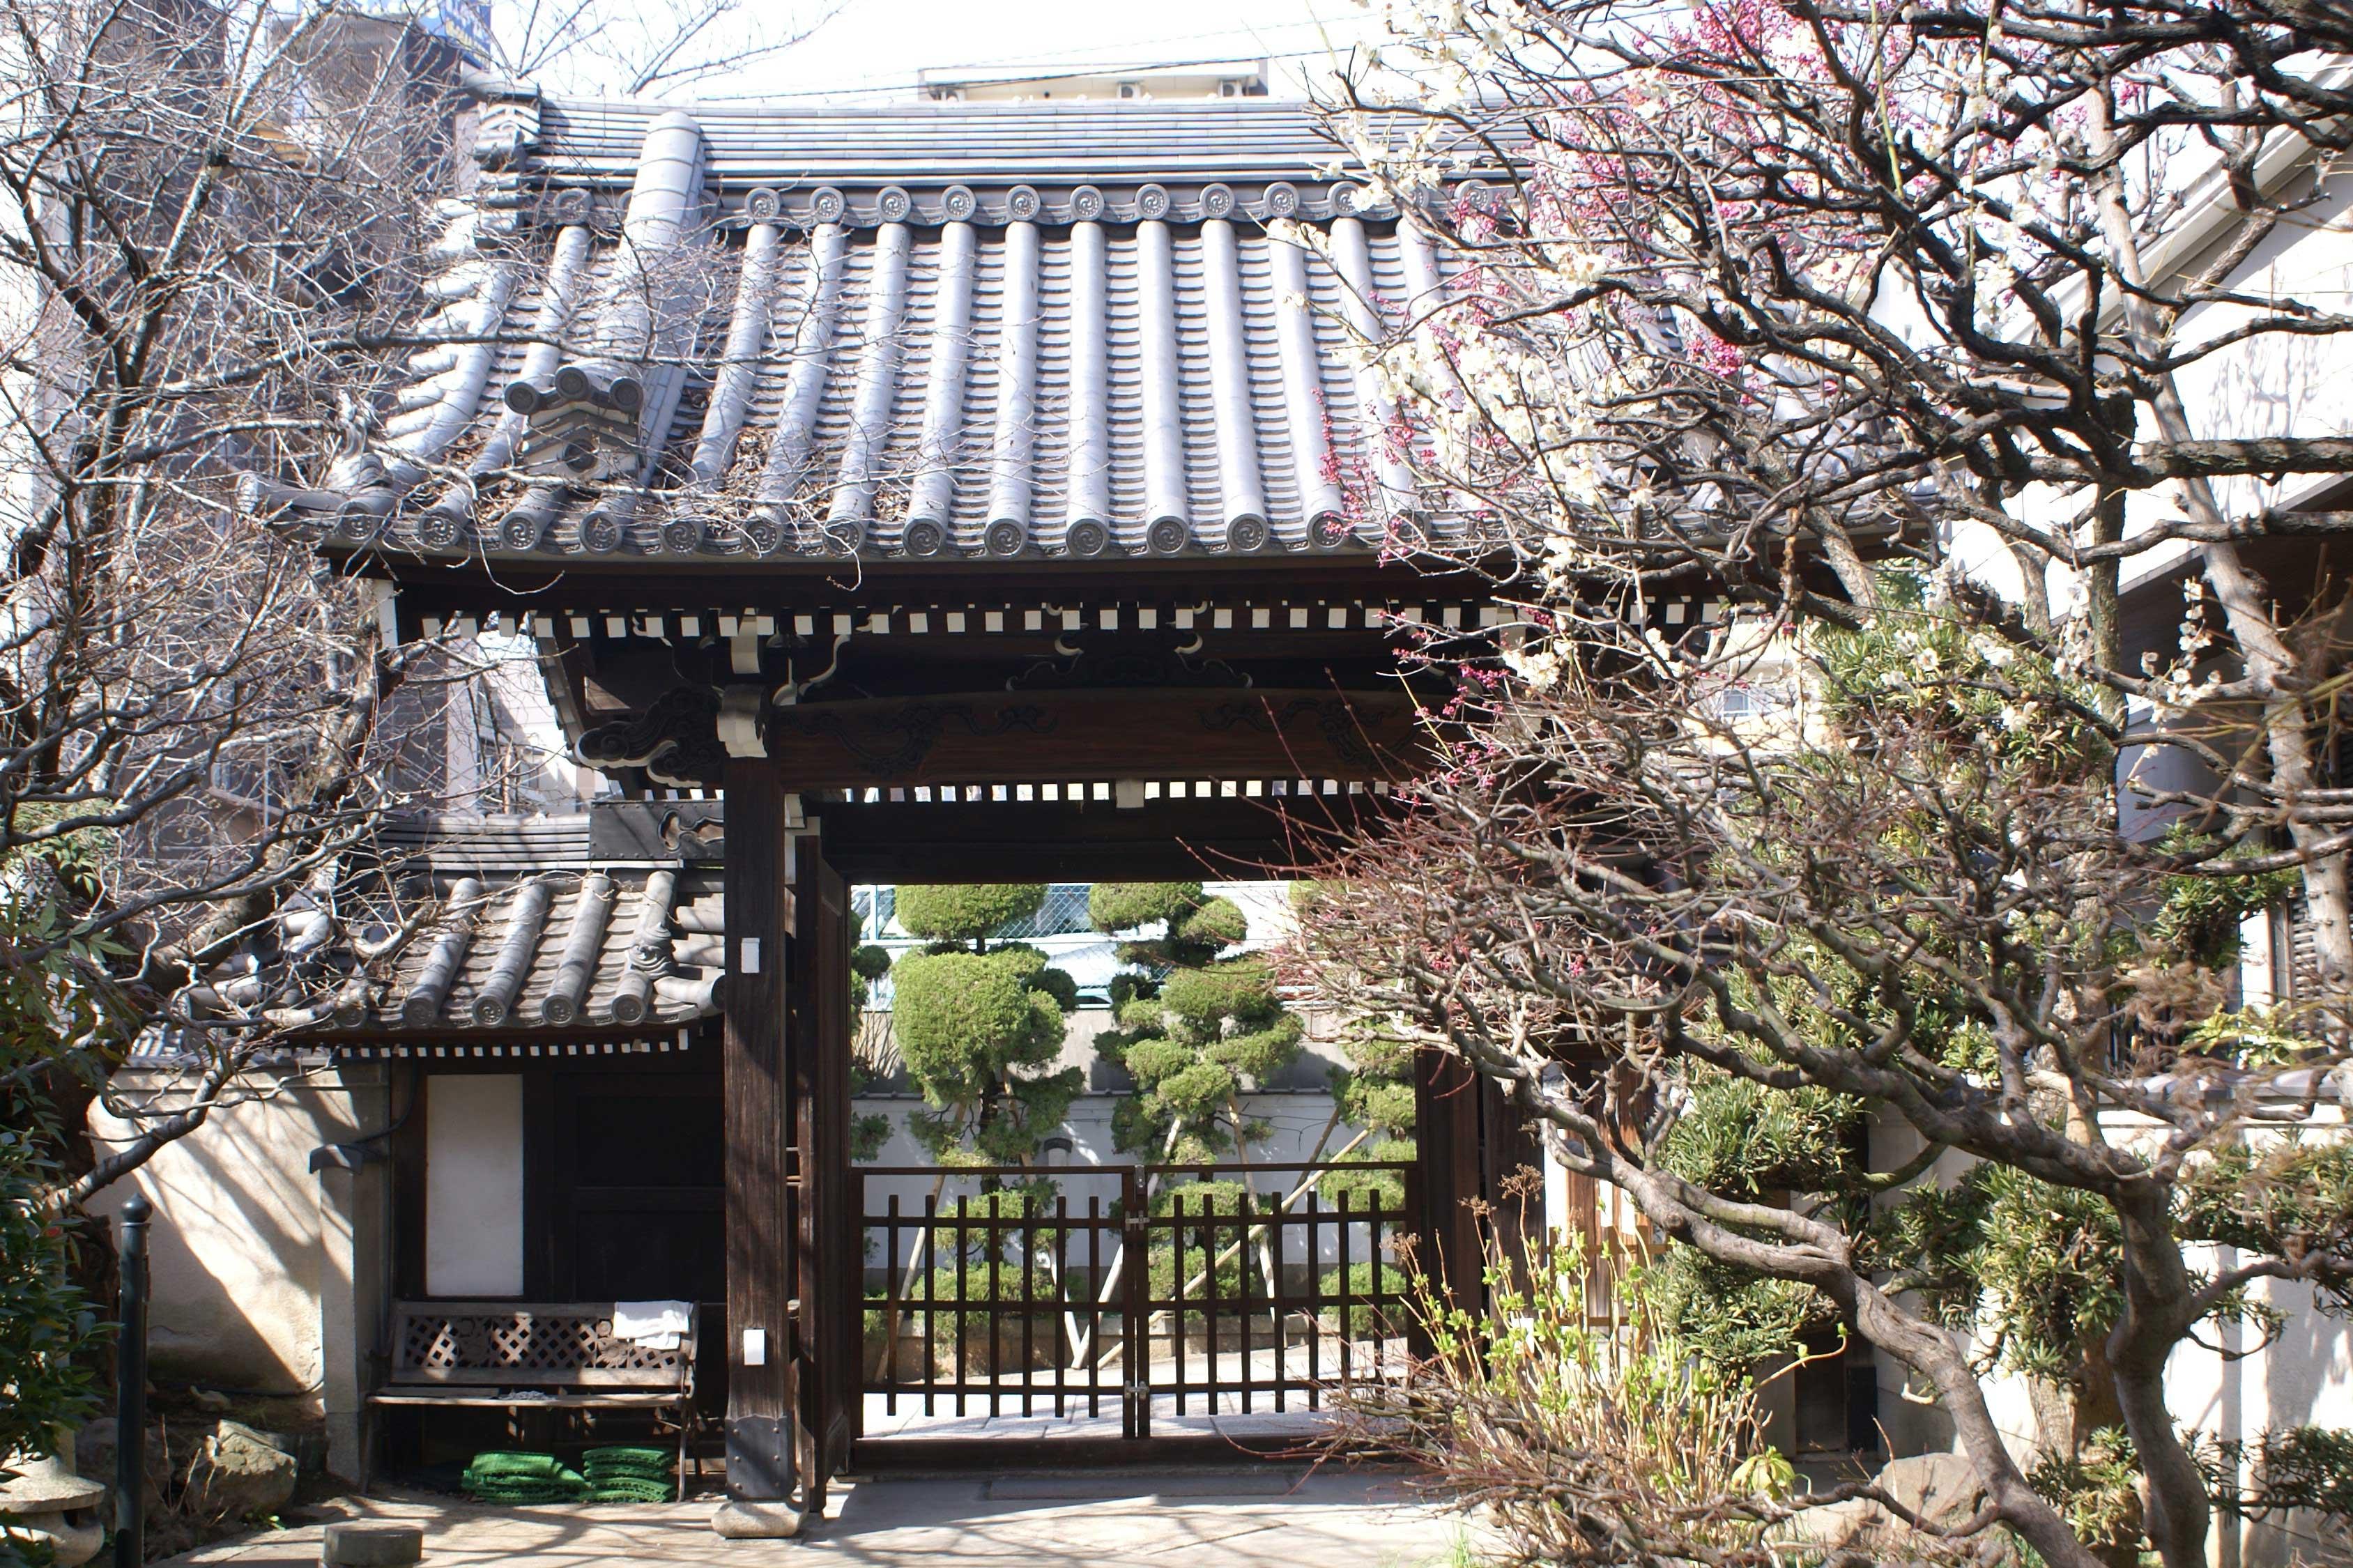 <p>由境内看山門。</p>善龍寺於慶長7年(1602)僧宗林開創。因受戦災只留下山門,其他全焼了。原来是在松屋町筋沿街,昭和47年再建時搬到此地。境内的櫻花樹和「海中出現地蔵尊」是有名的。